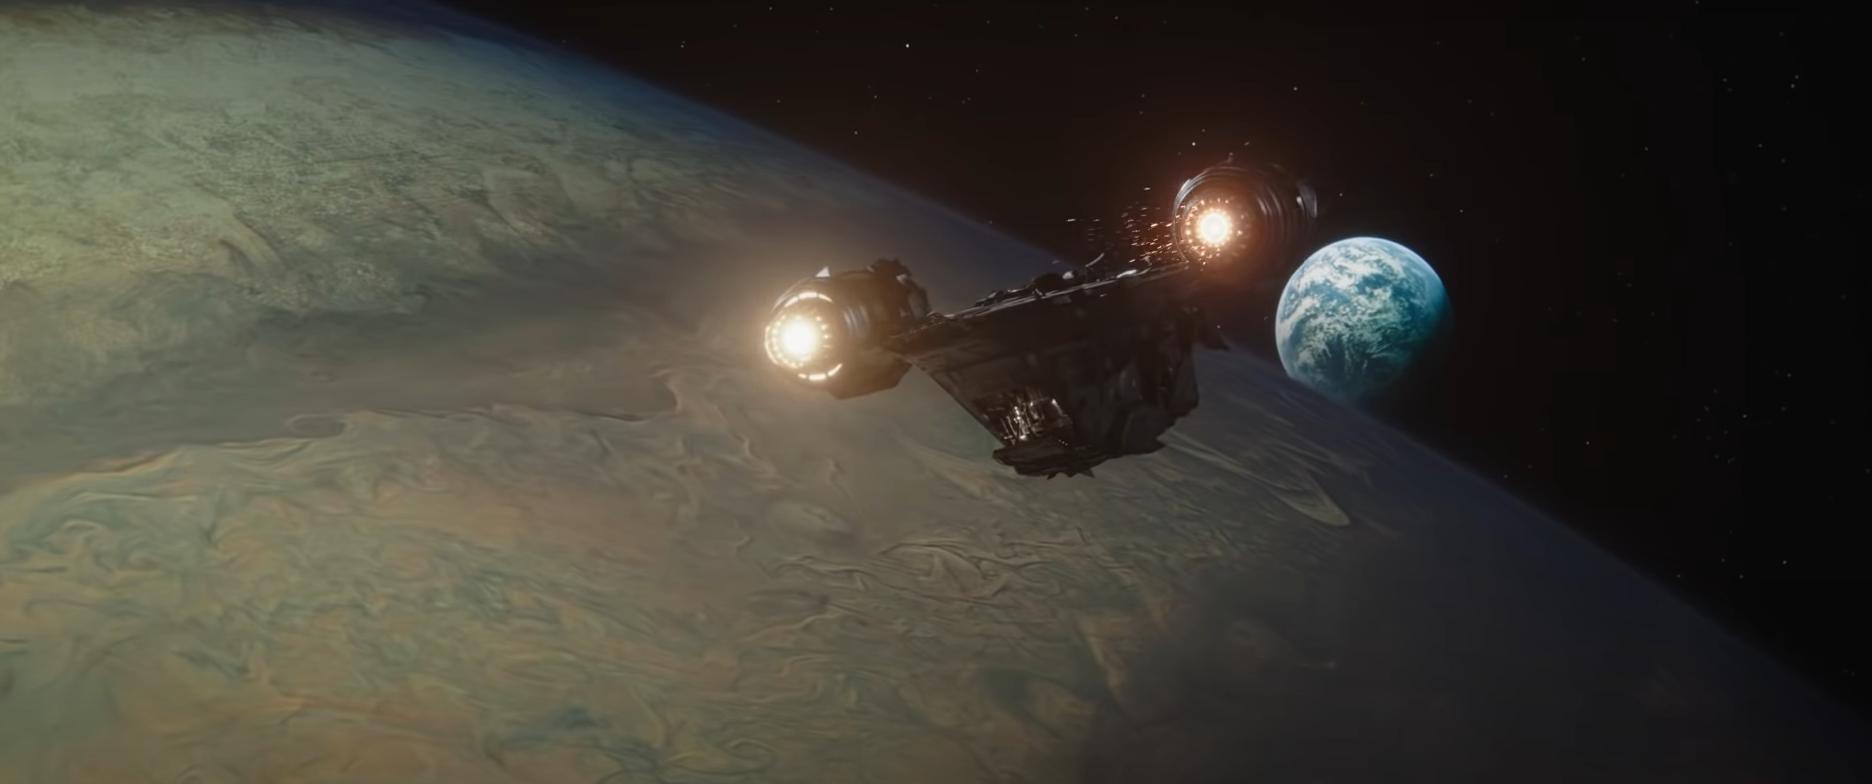 'Star Wars: The Mandalorian' Season 2 Trailer Breakdown